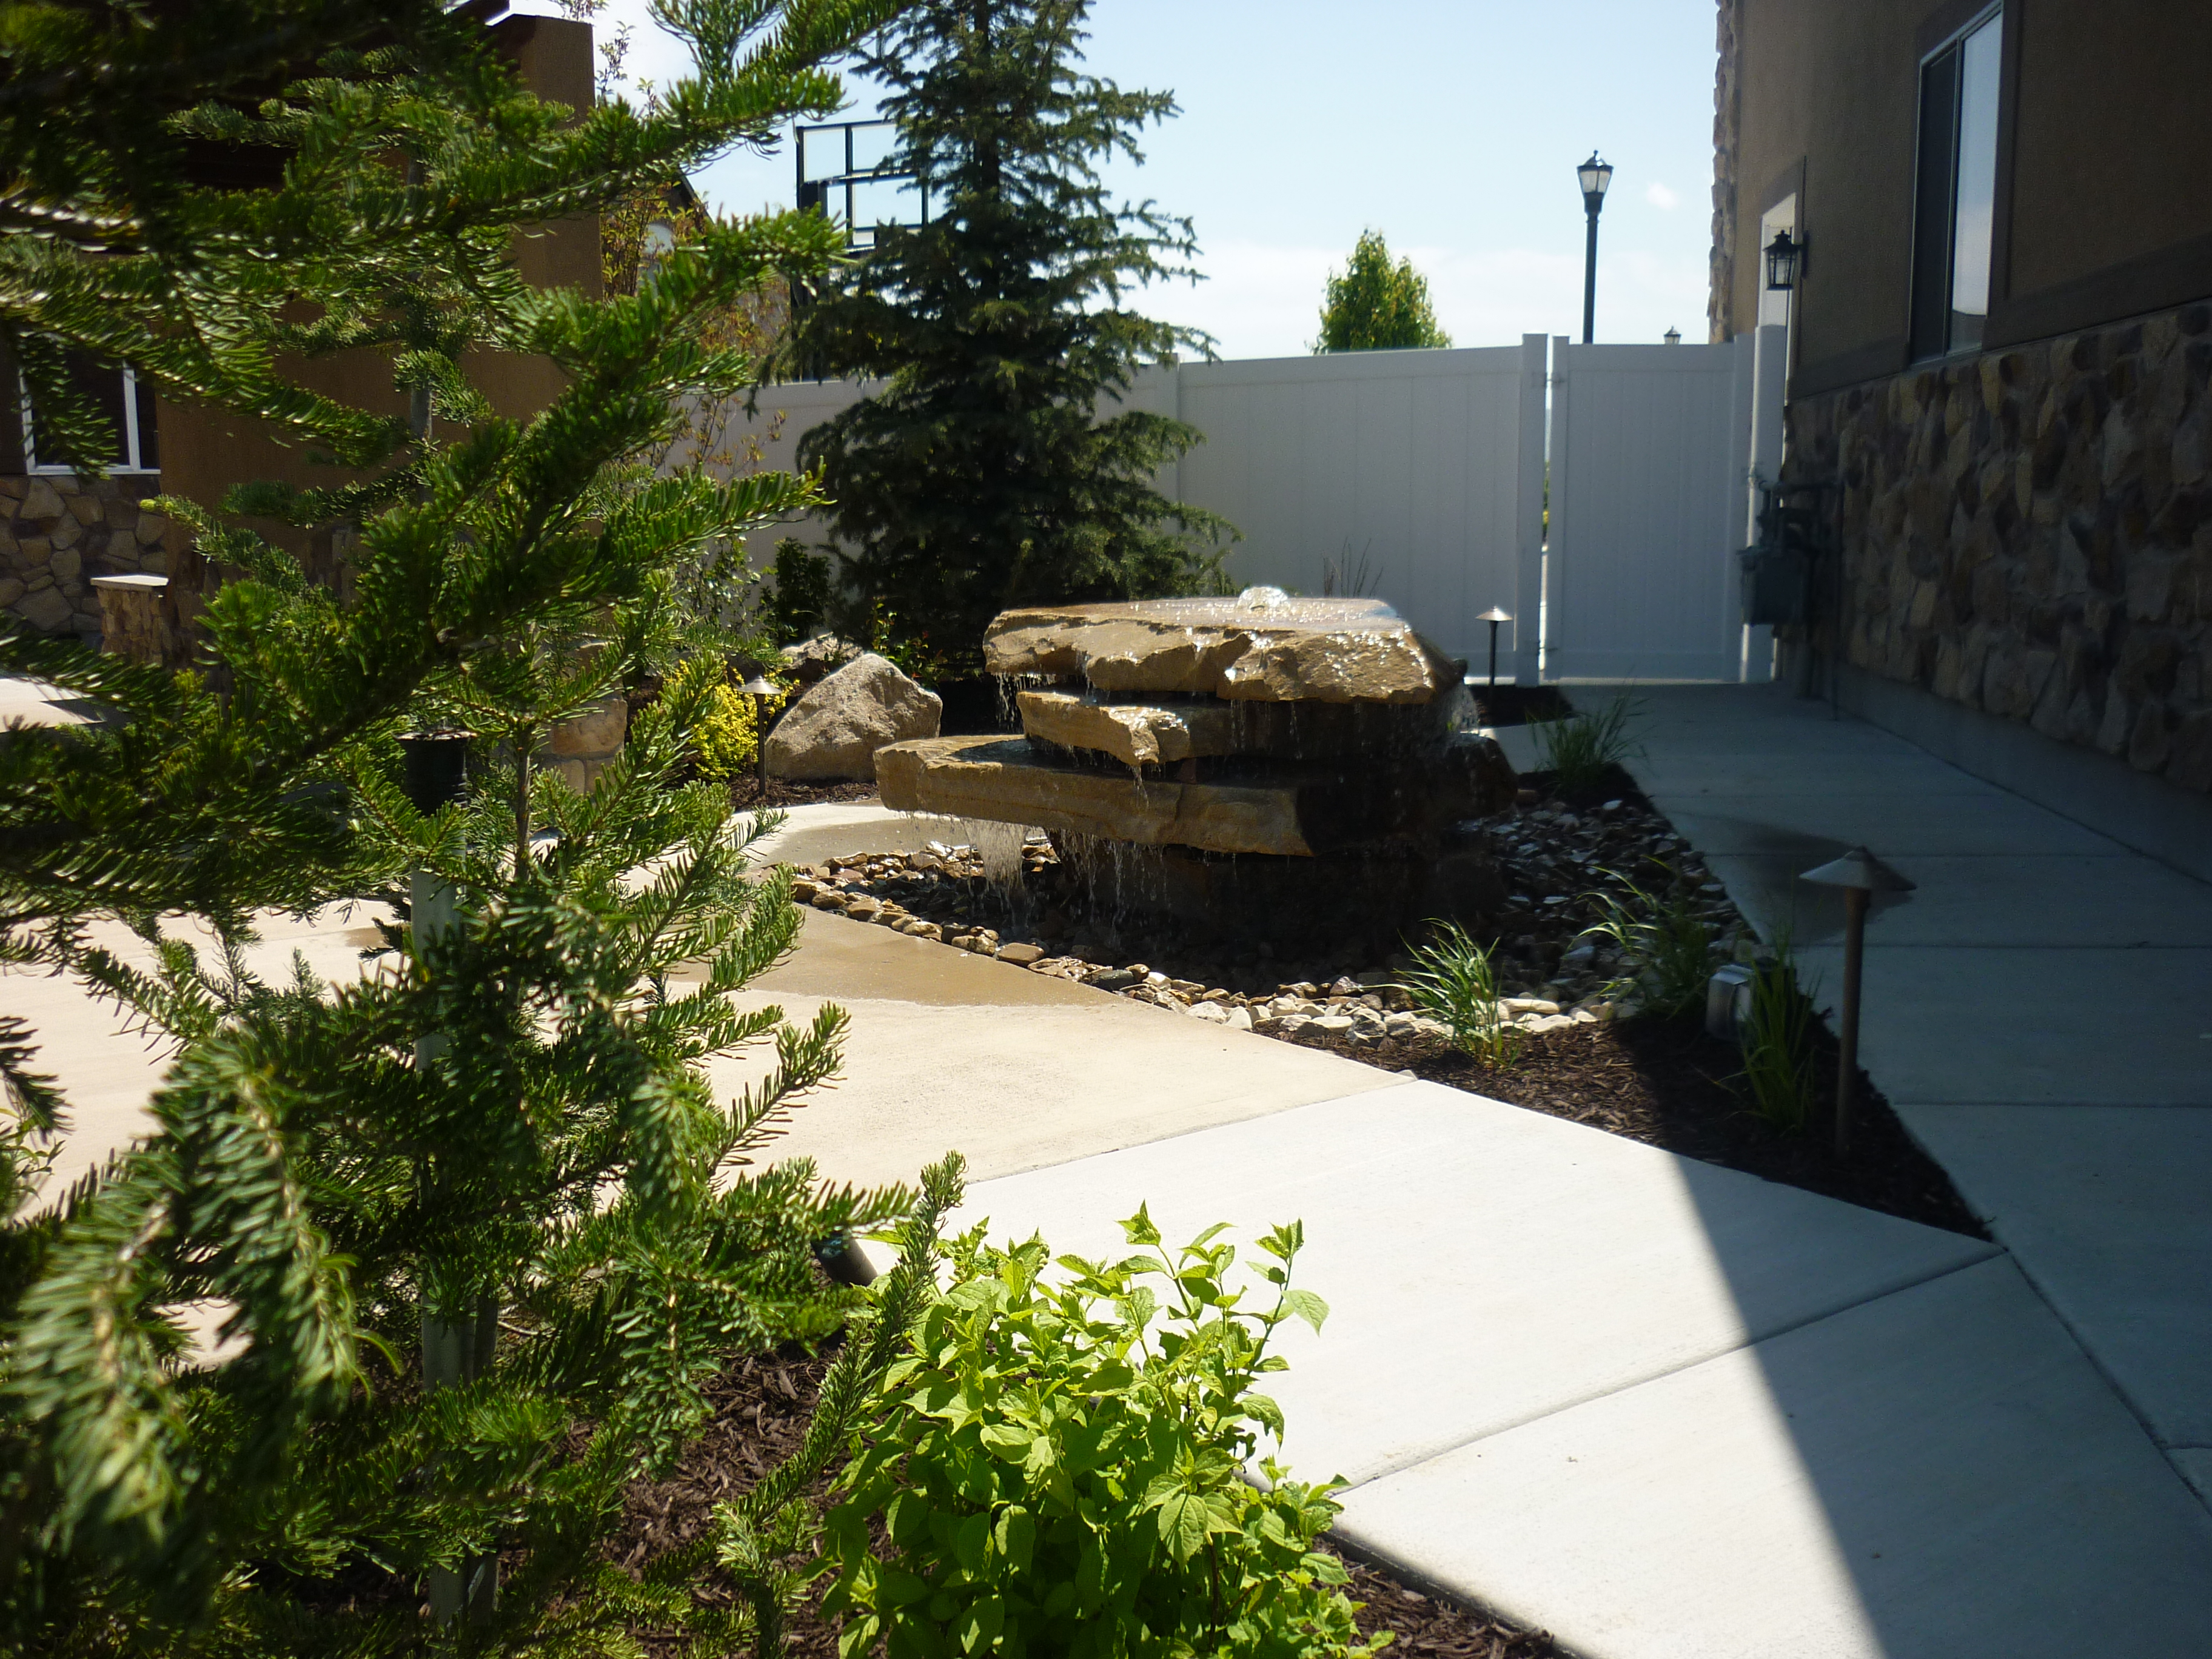 Layton utah landscapers chris jensen landscaping in salt for Landscaping rocks utah county